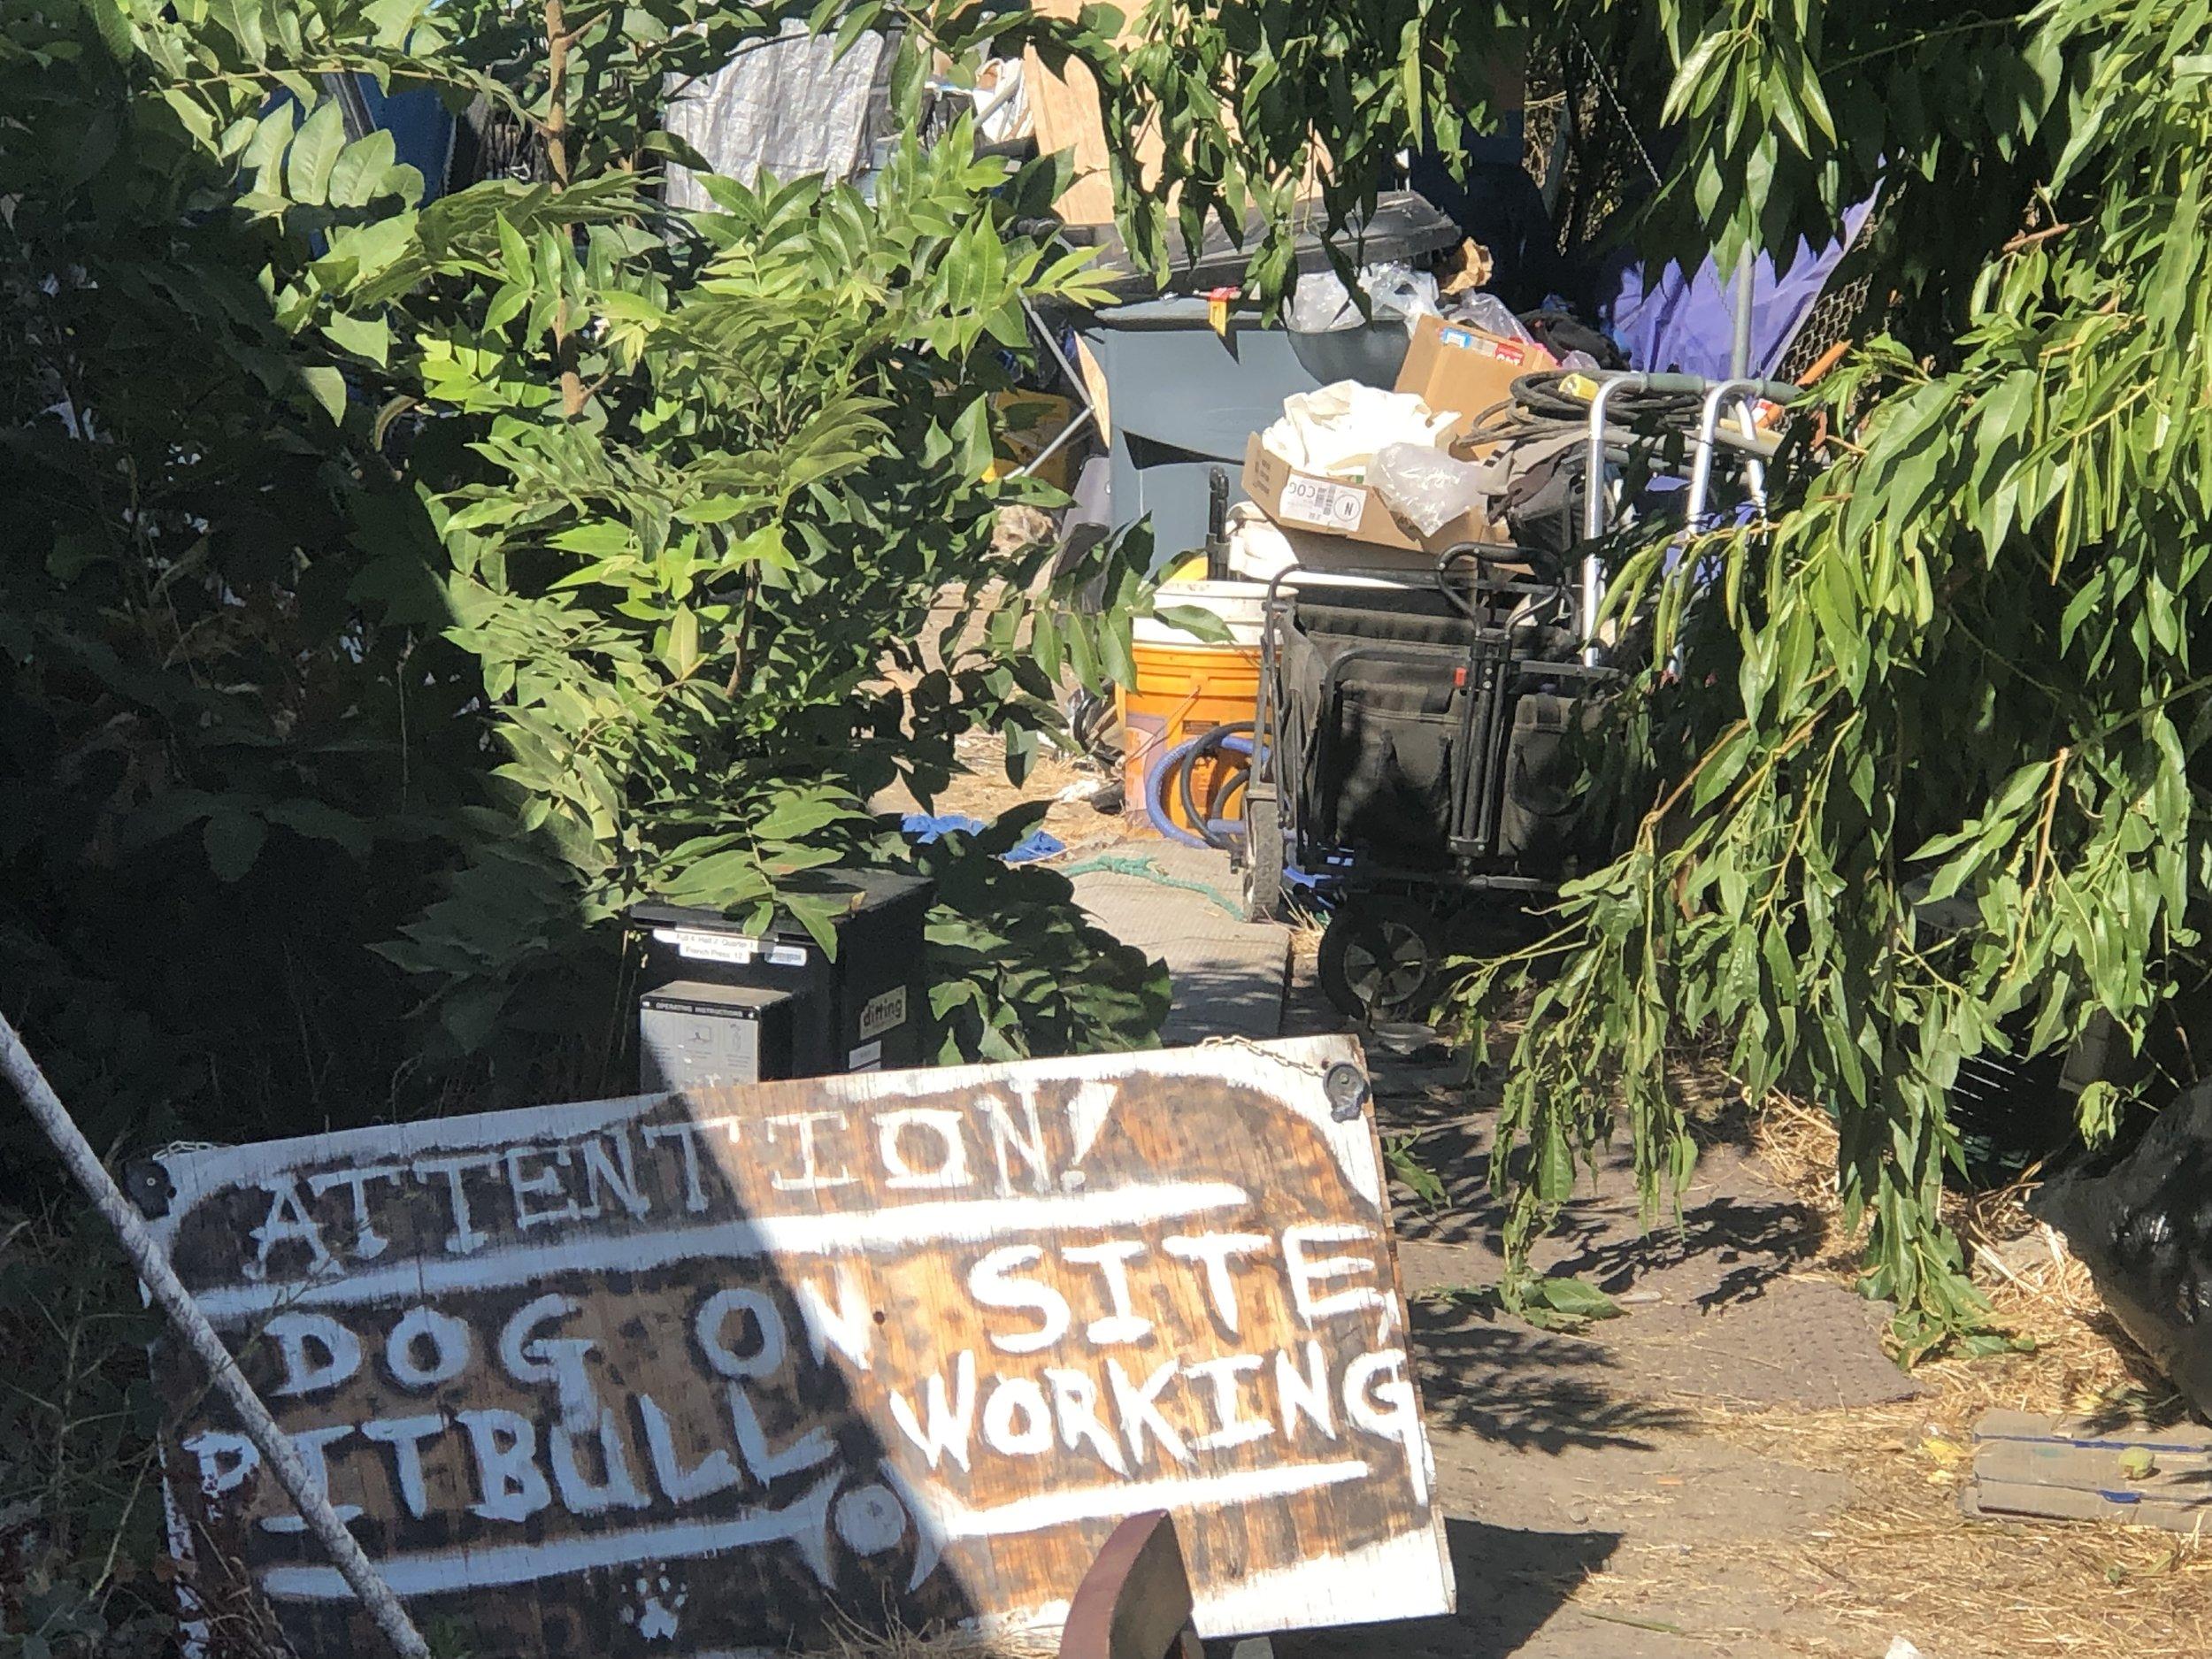 A homeless camp in south Sacramento